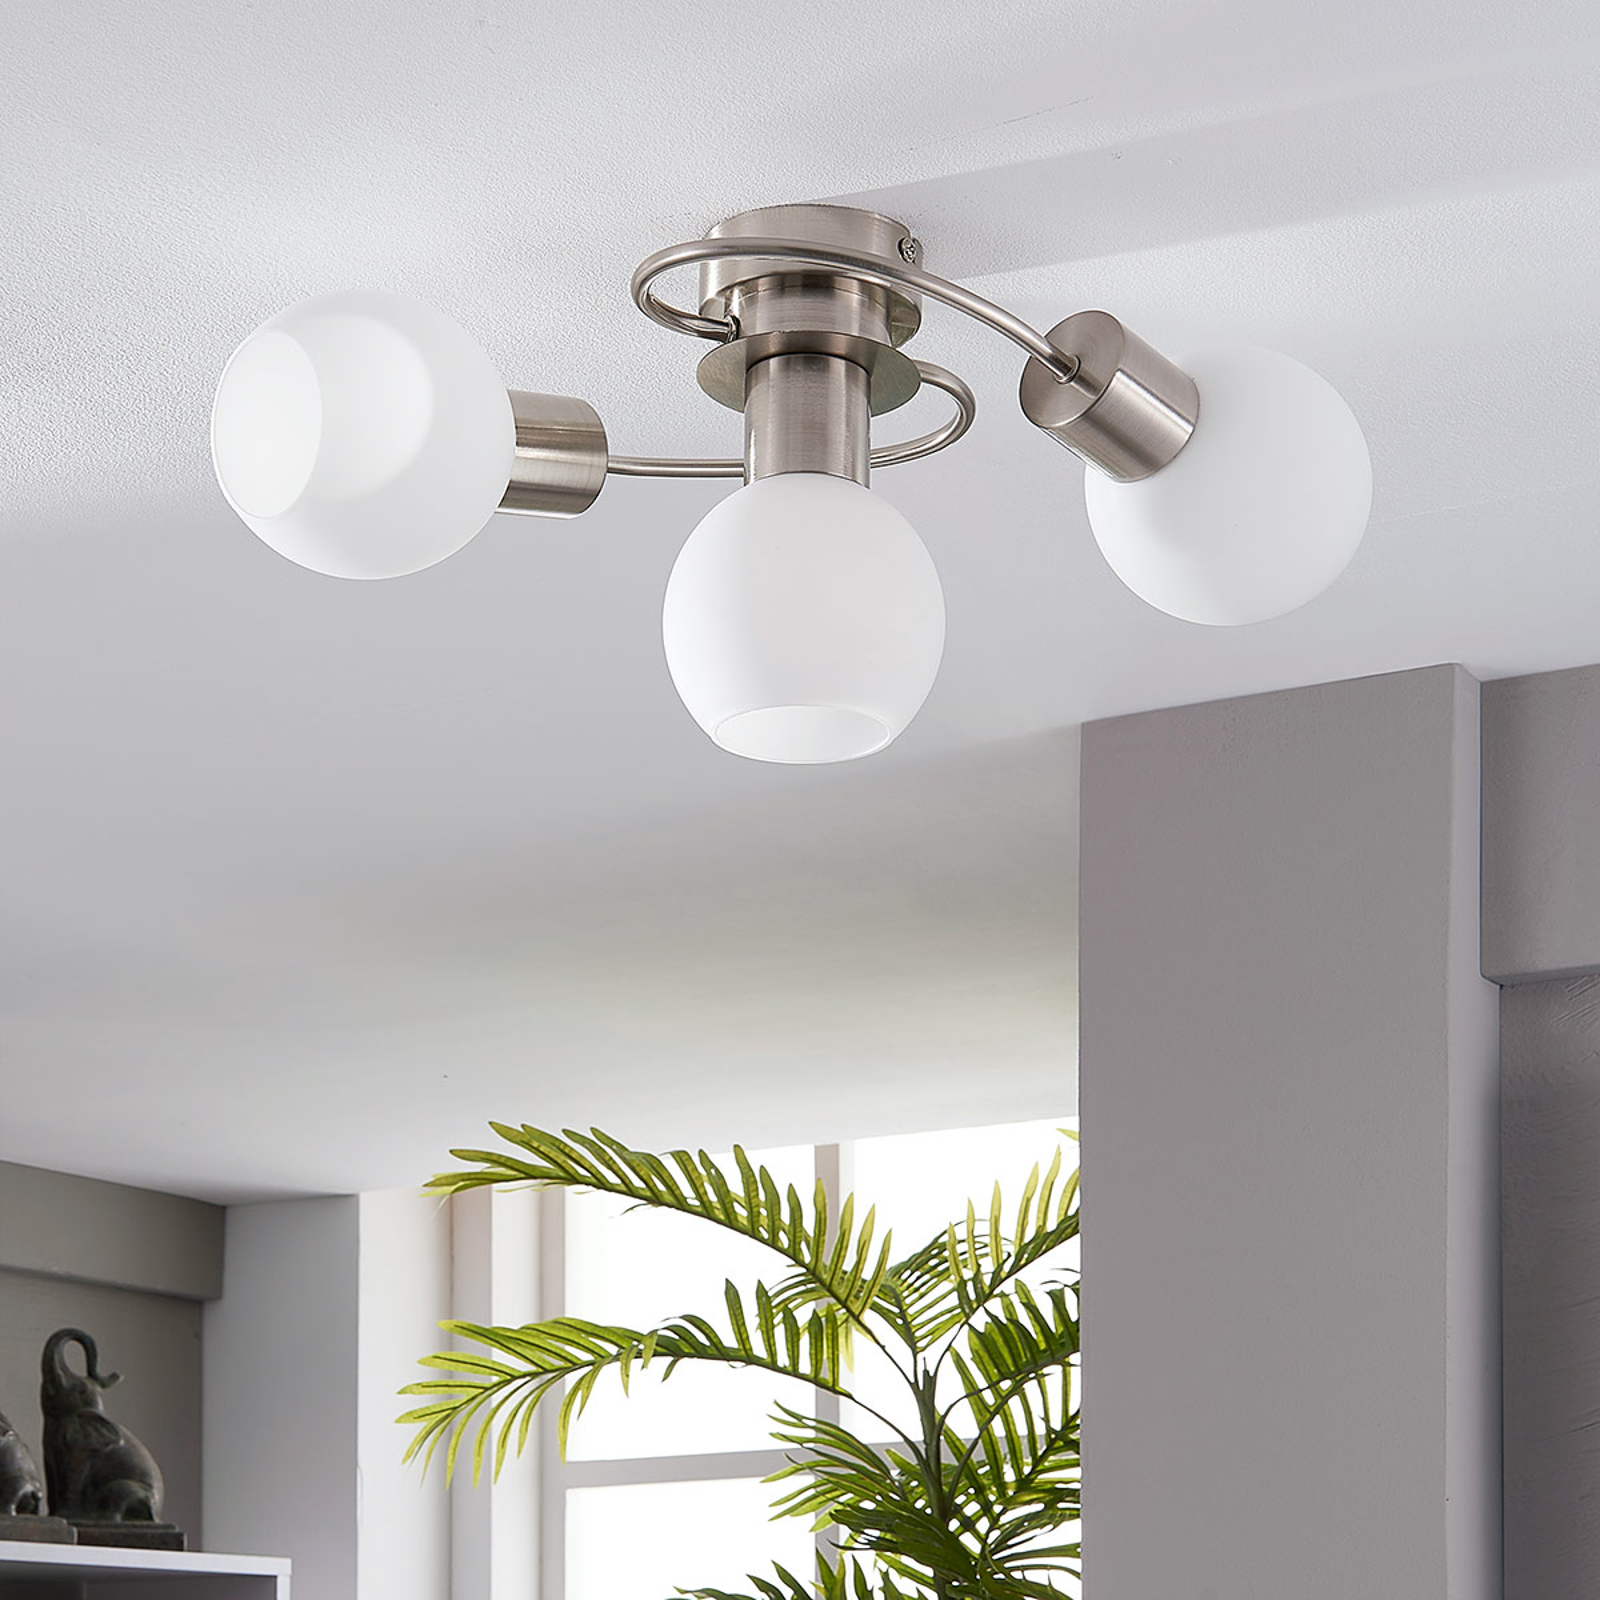 LED-taklampa Ciala, 3 lampor, nickel